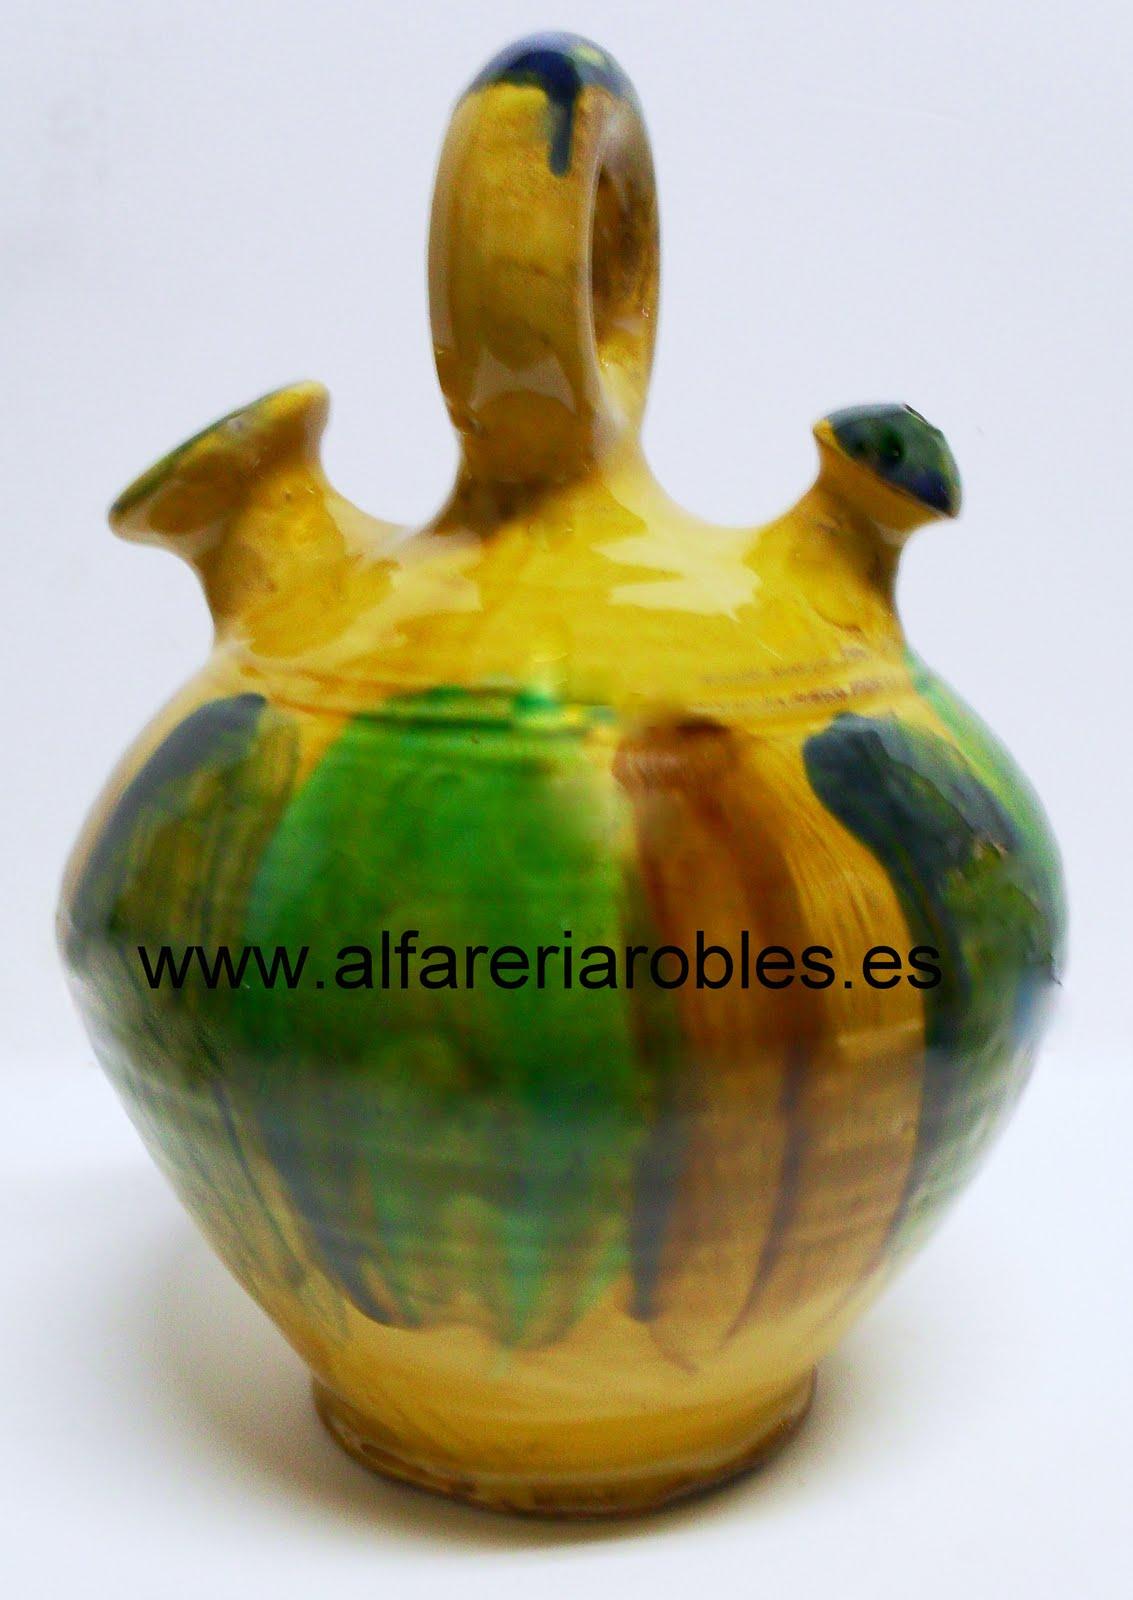 Alfarer a cer mica robles artesan a de almeria botijos - Botijo de barro ...